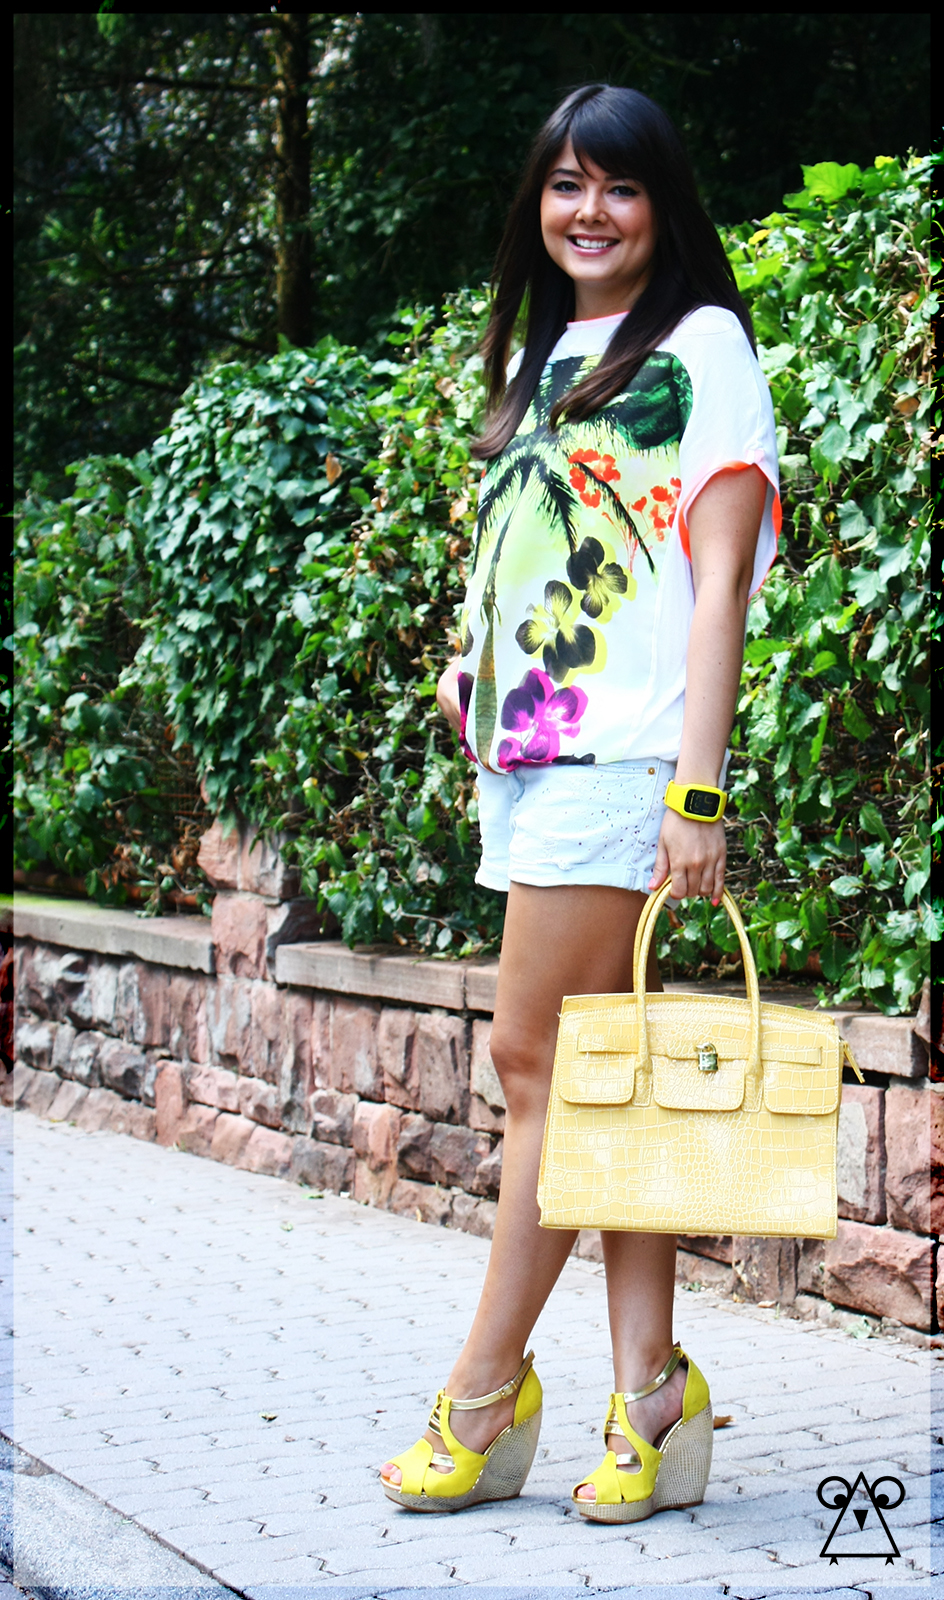 fashionambit-fashionblog-muenchen-styleblog-munich-blogger-deutschland-fashionblogger-bloggerdeutschland-style-blog-lifestyle-blog-modeblog-river-island-